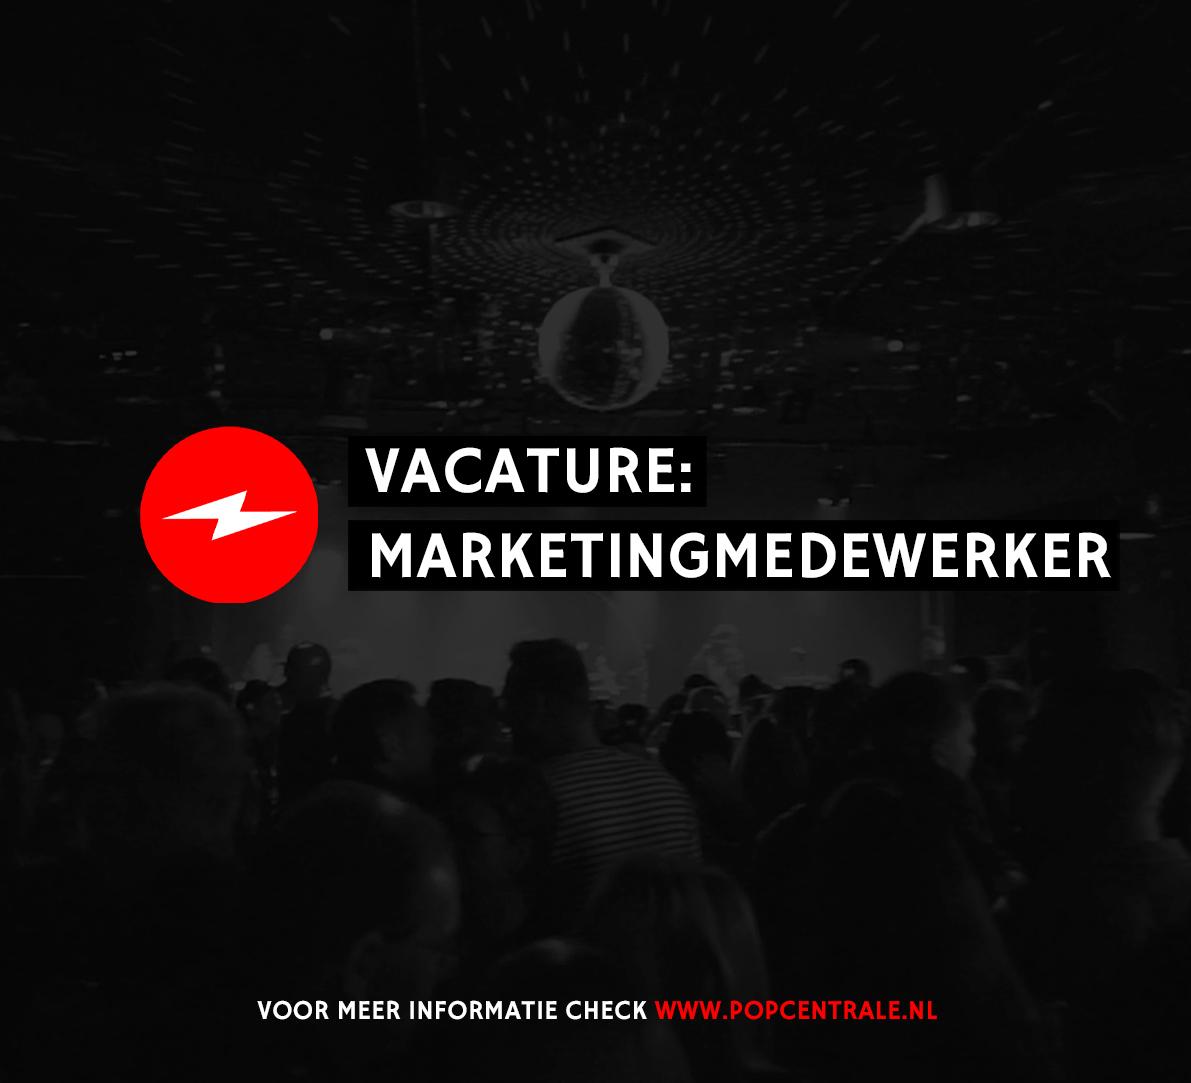 Vacature: Marketingmedewerker